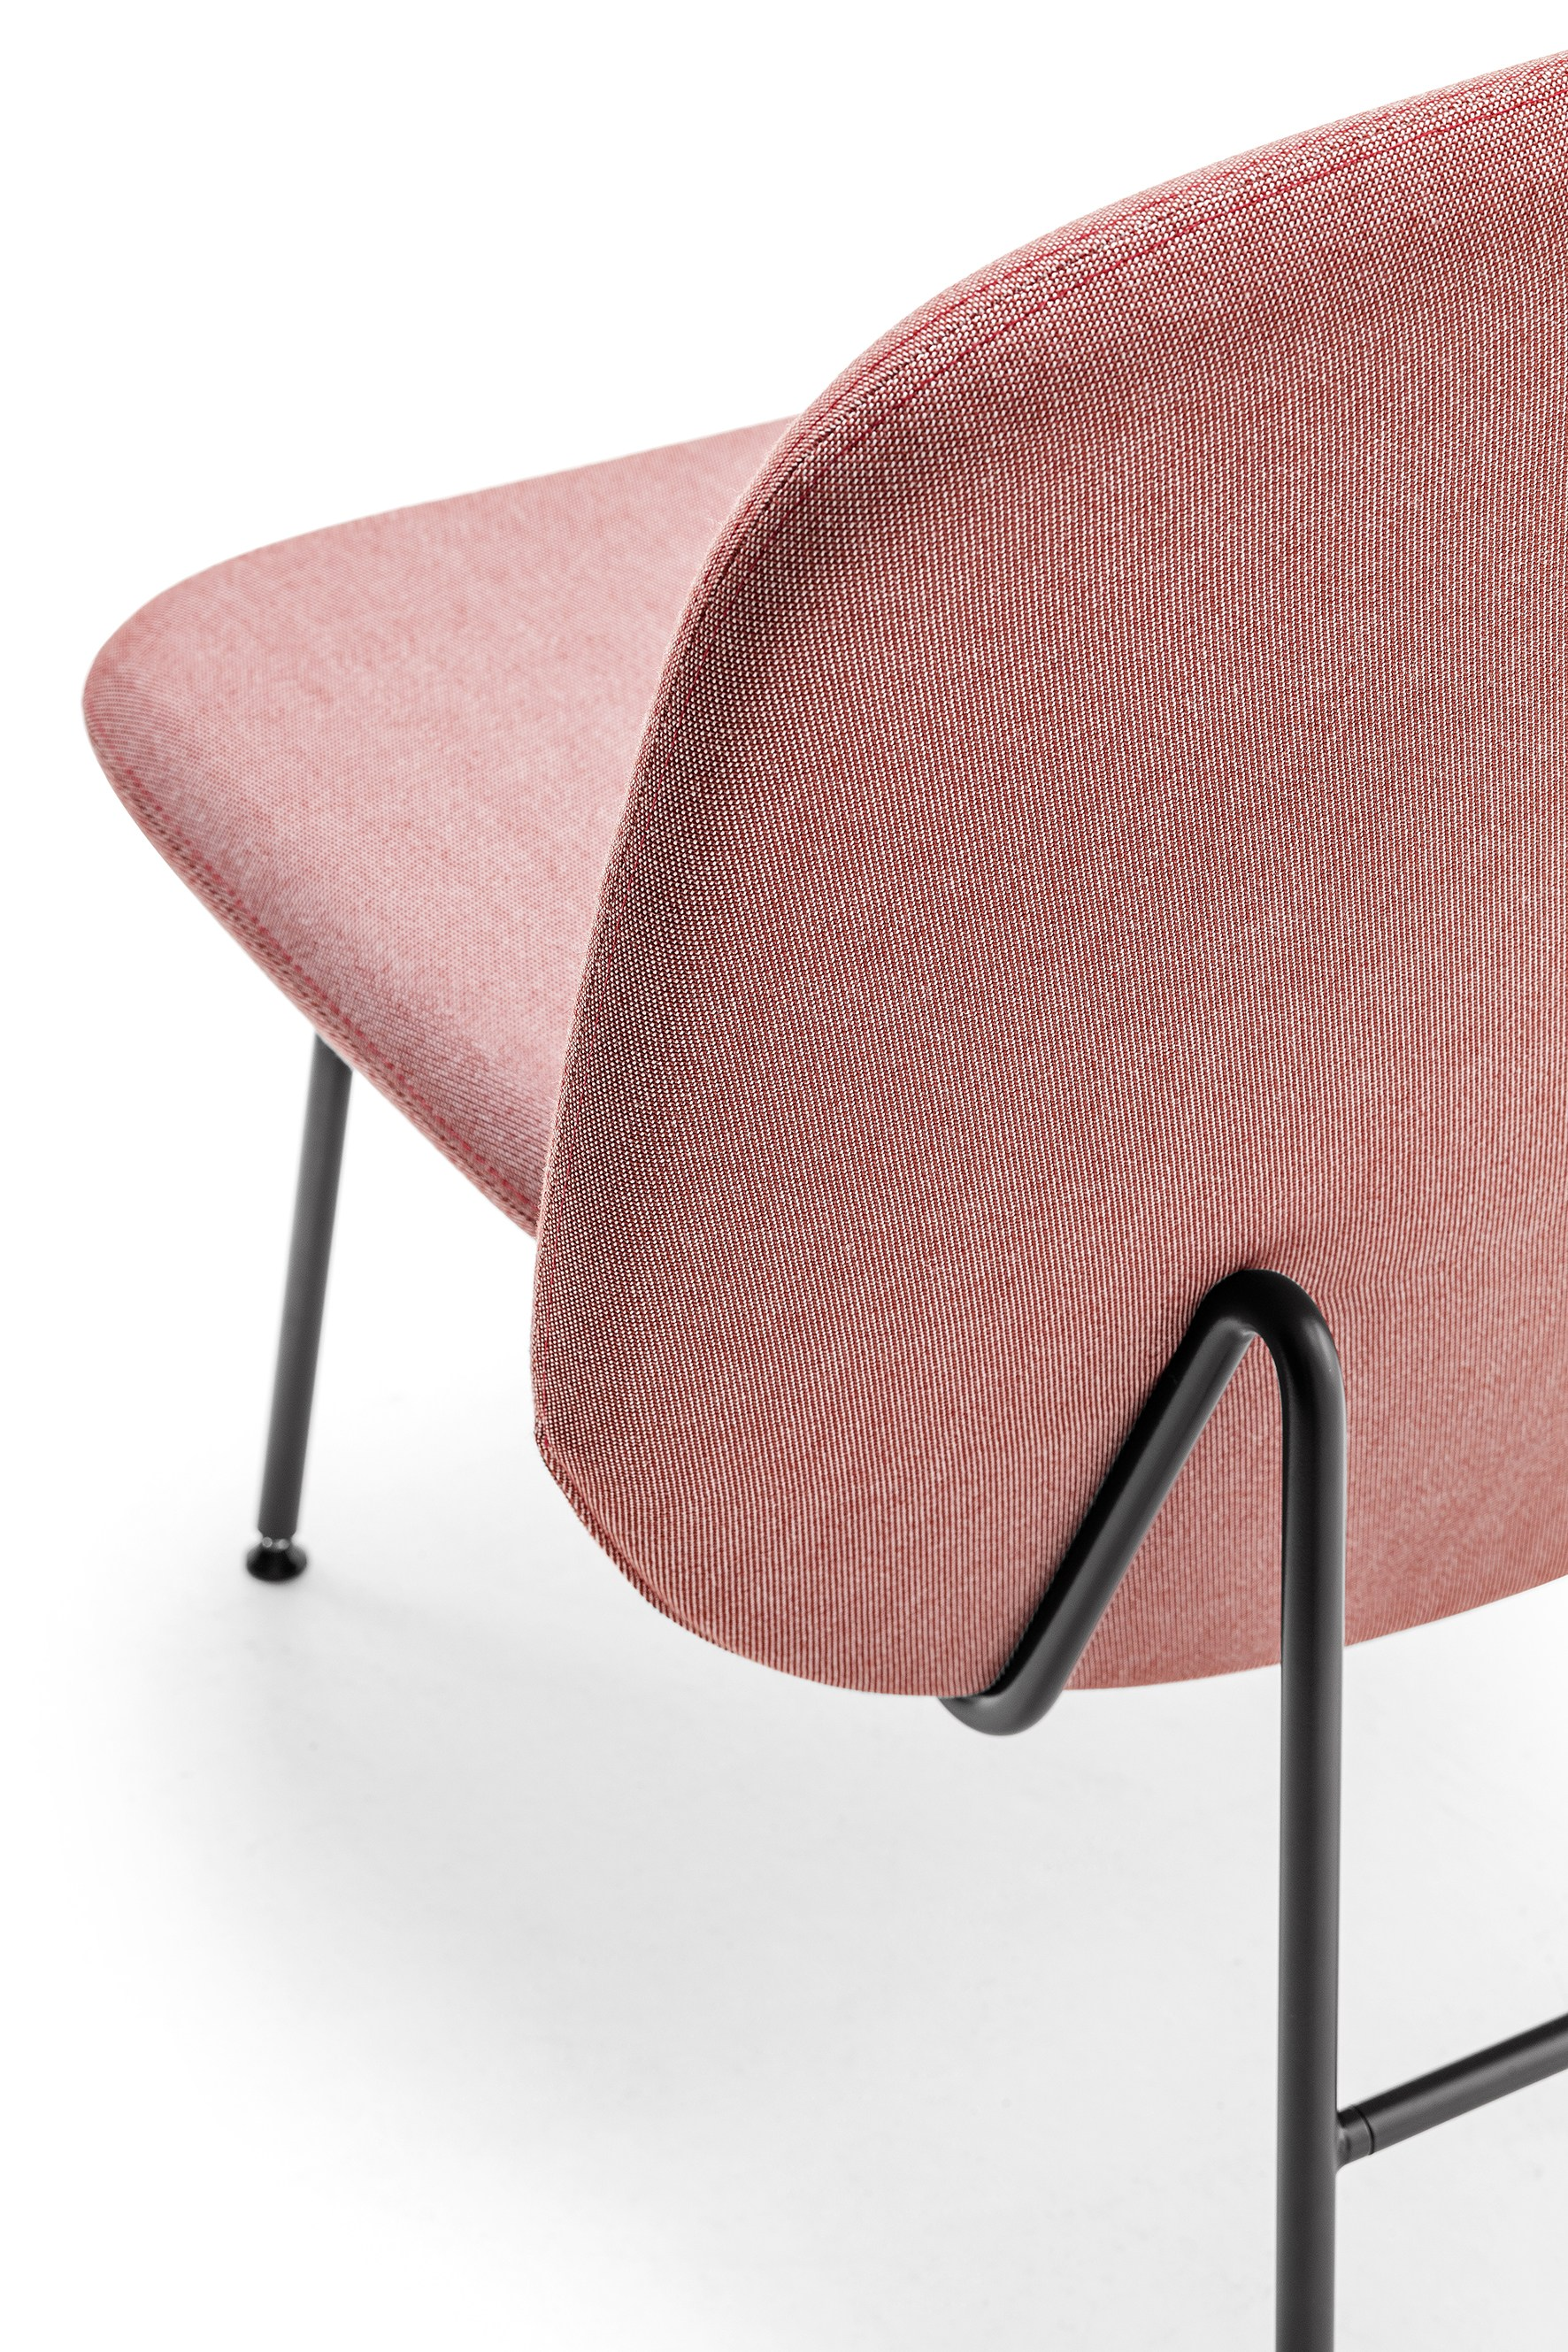 Ala Easy Chair by Sebastian Herkner for La Cividina